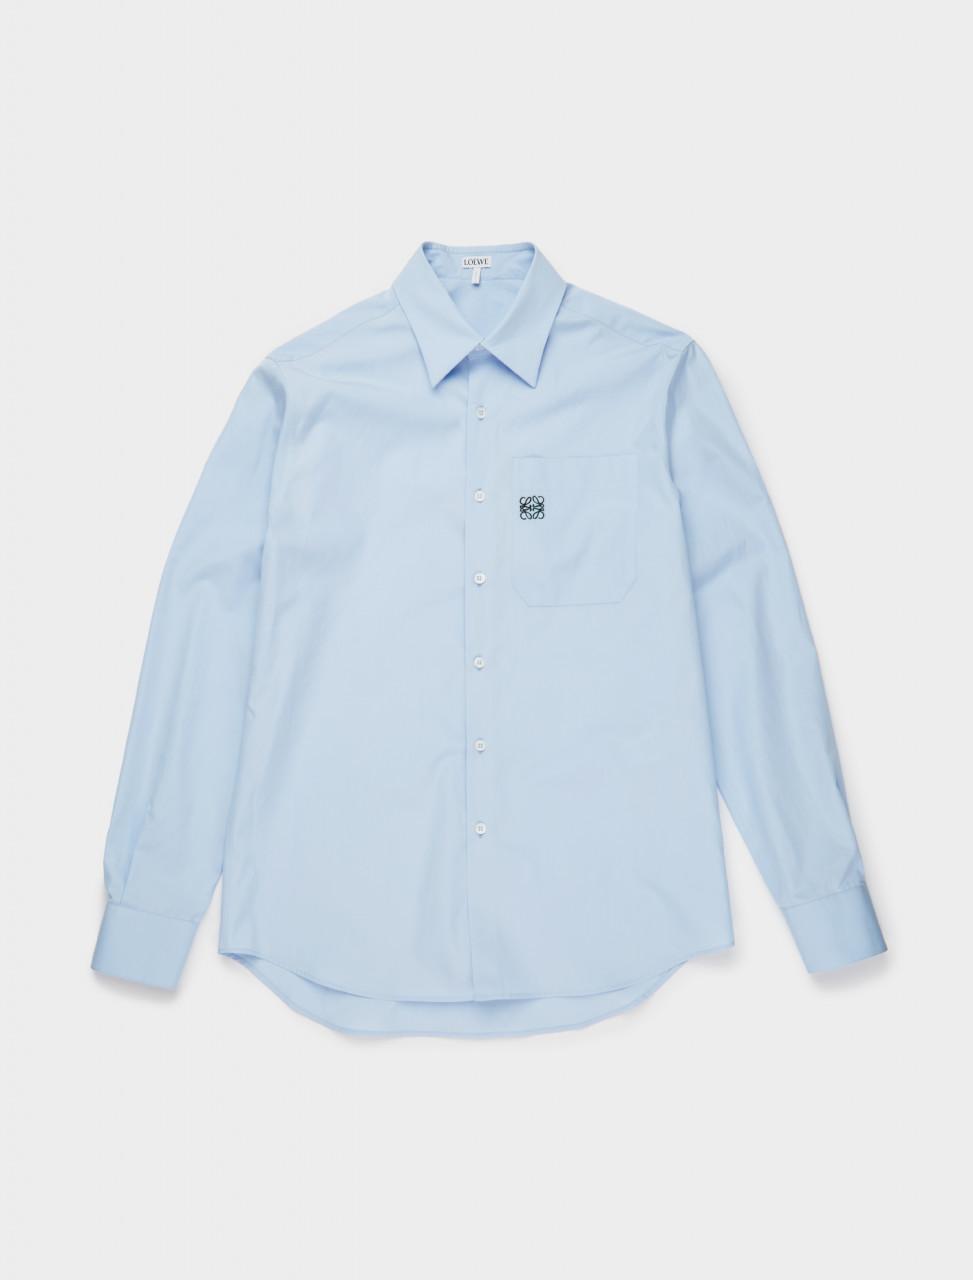 251-H526337X89 LOEWE ANAGRAM SHIRT BABY BLUE